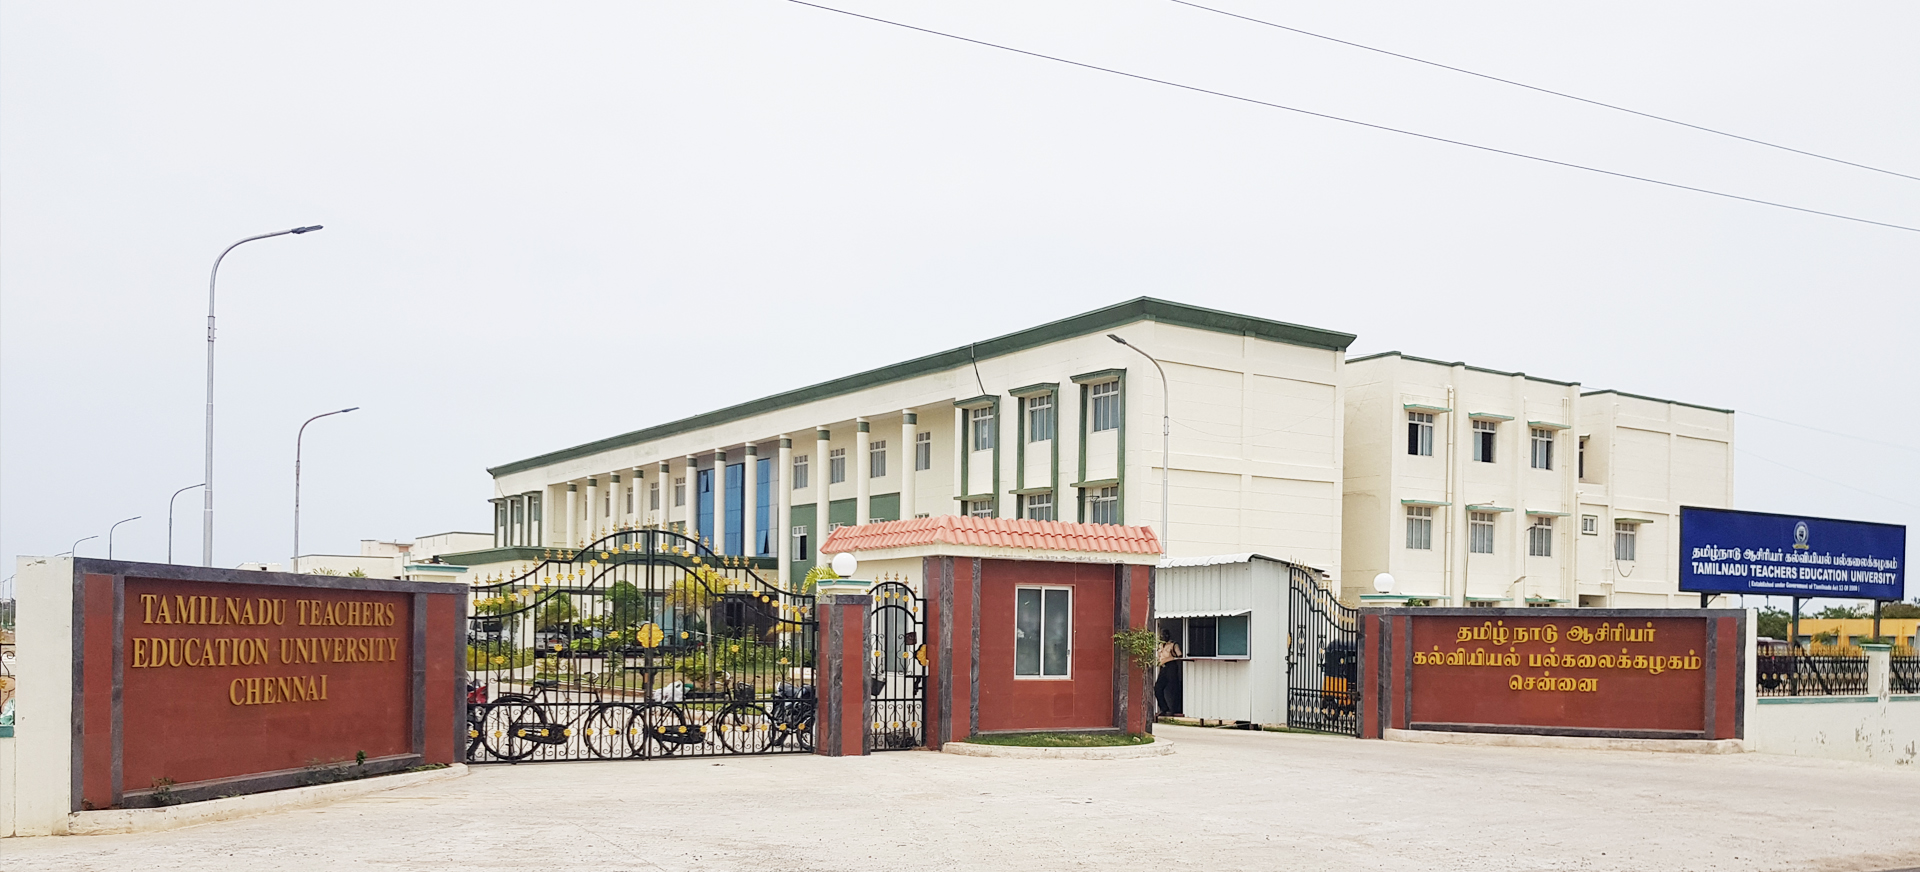 TNTEU (Tamil Nadu Teachers Education University)